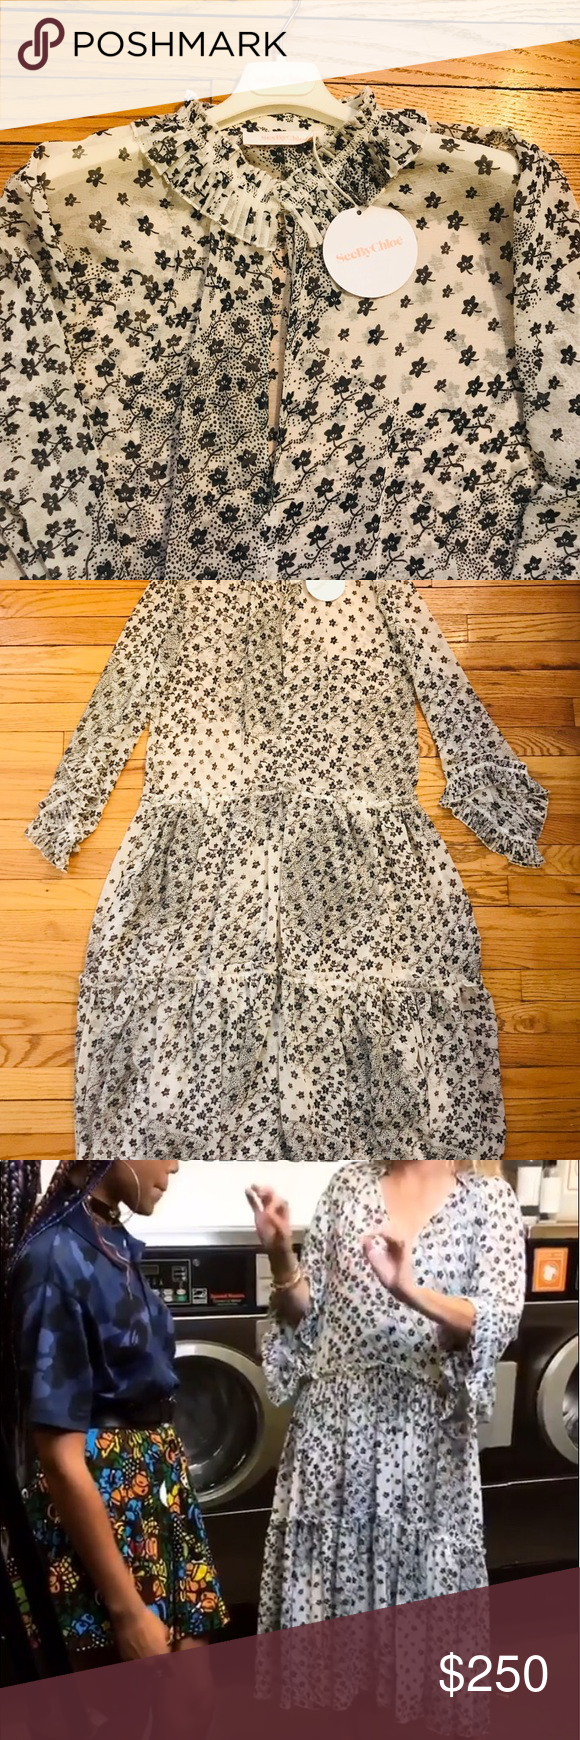 NWT See by Chloe RTW dress Brand new, never been worn See by Chloe long flowy dress See By Chloe Dresses #seebychloe